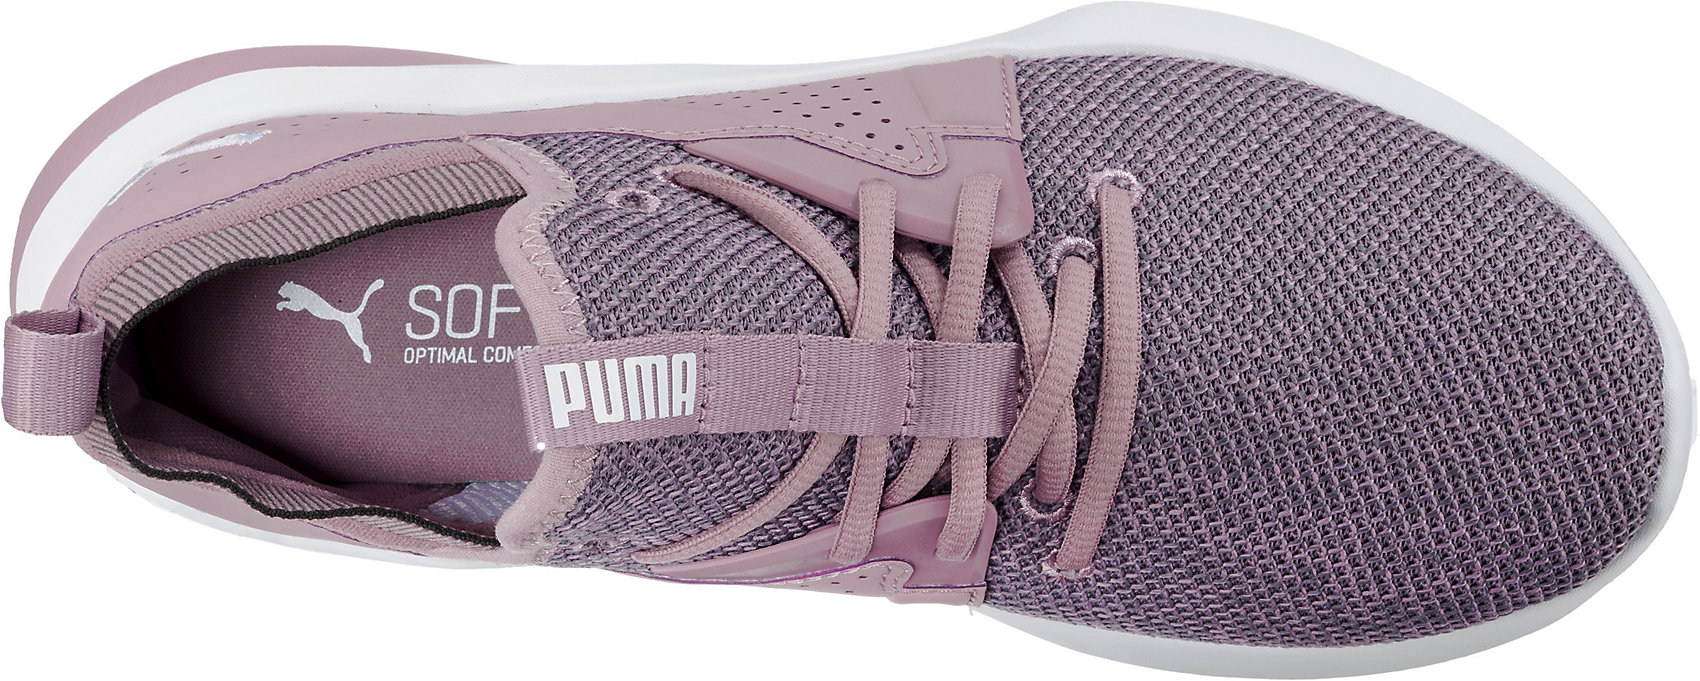 Neu PUMA Emergence Wn/'s Fitnessschuhe 10532516 für Damen